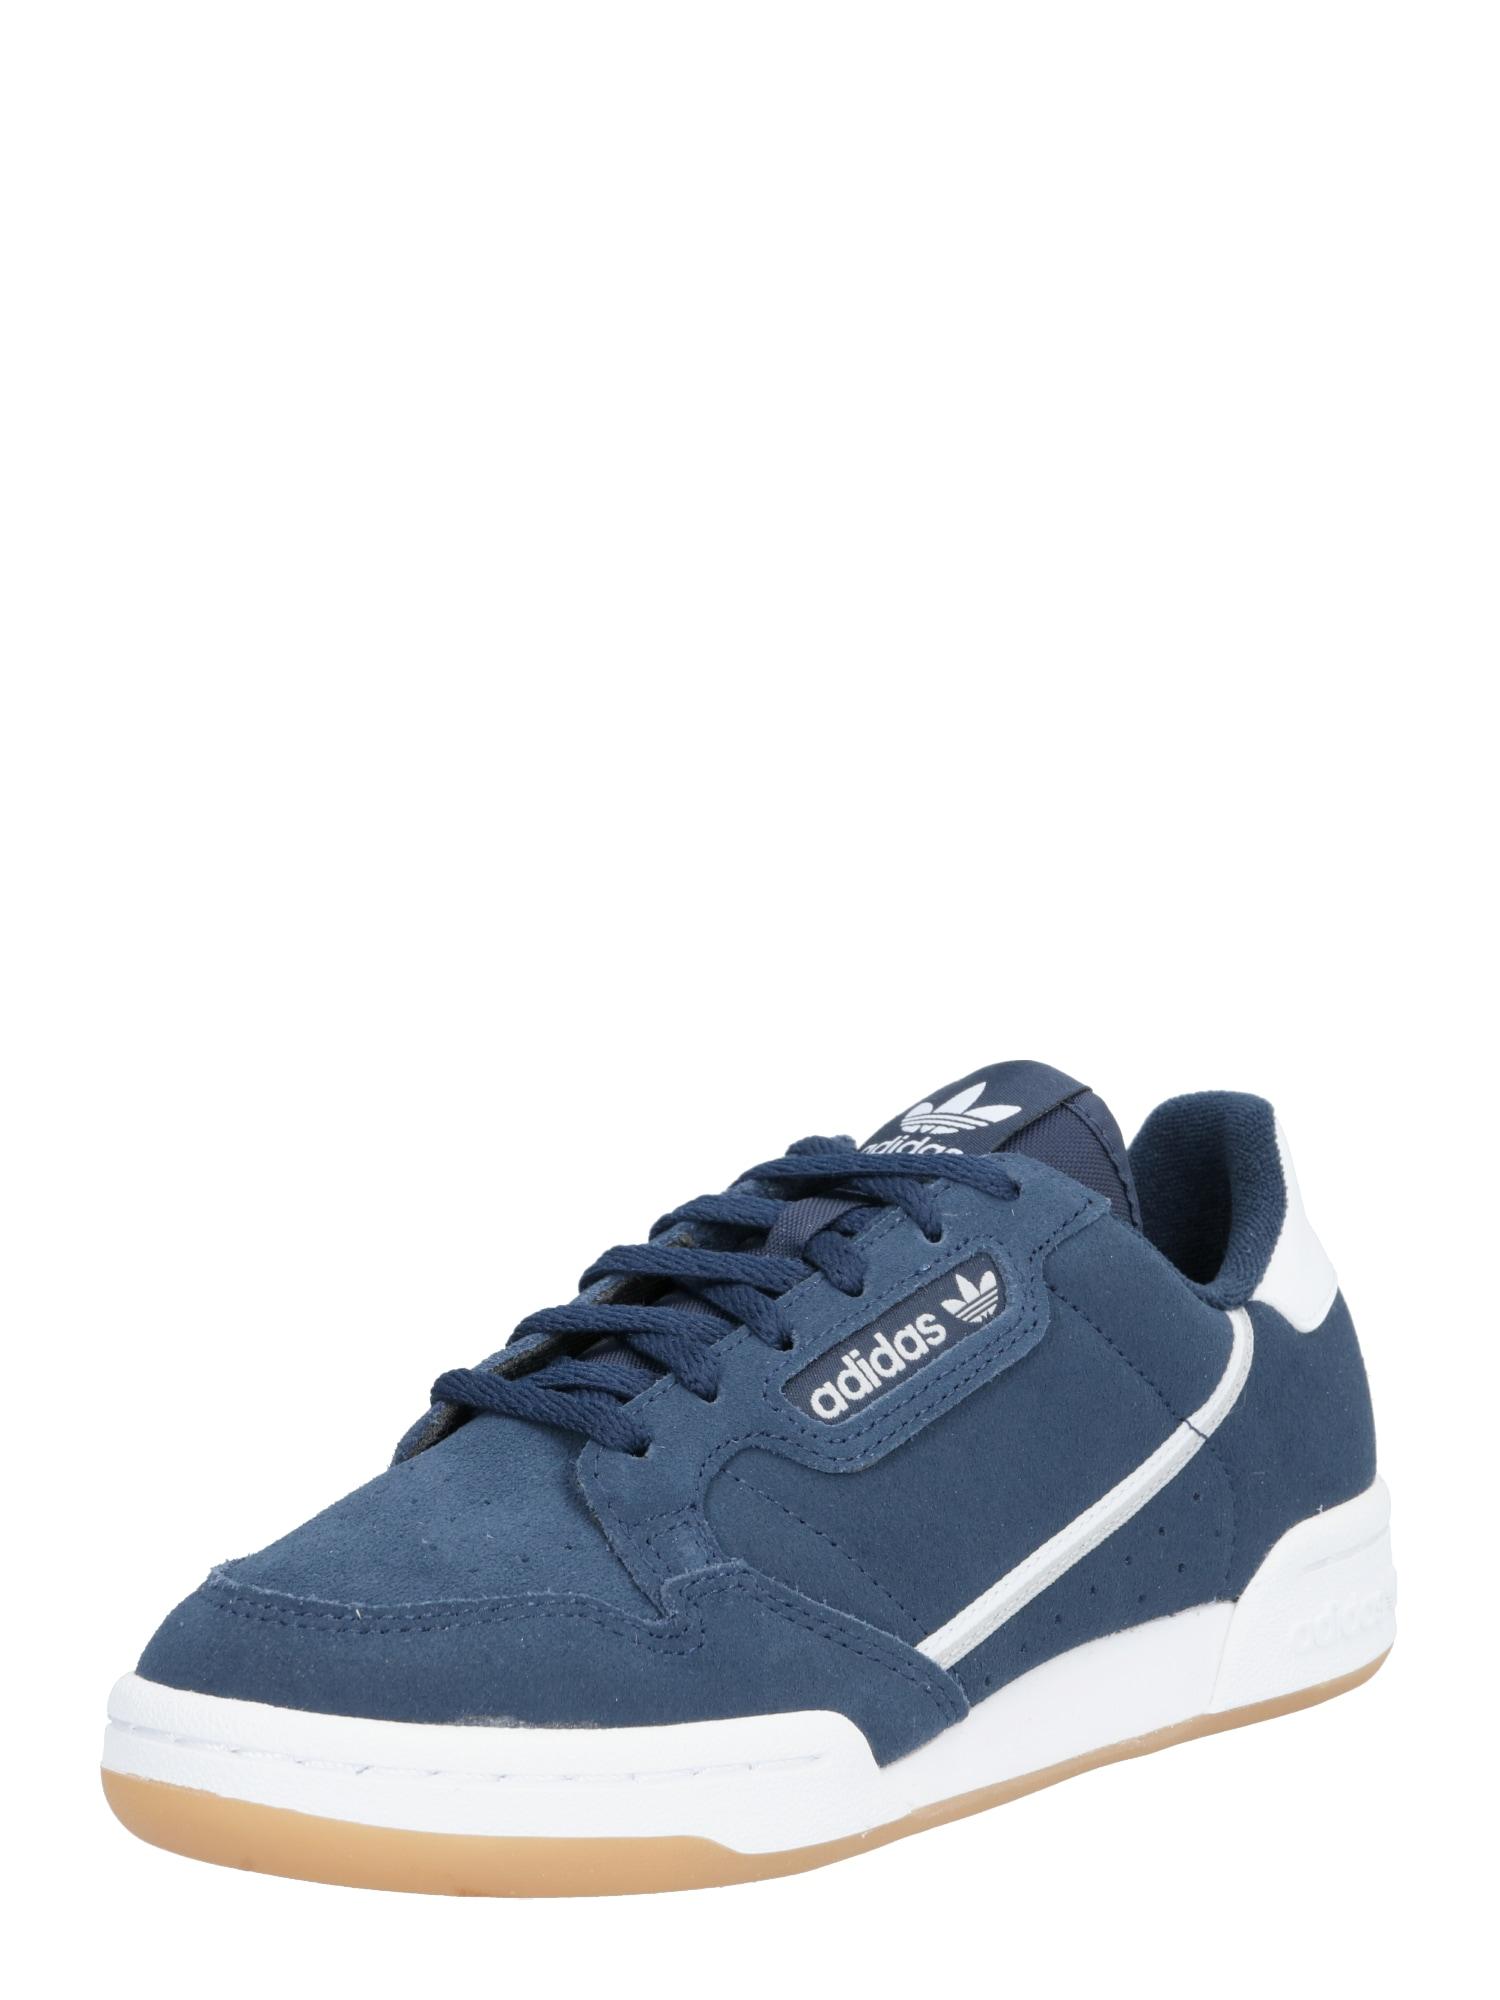 ADIDAS ORIGINALS Sportbačiai 'Continental 80 J' balta / mėlyna